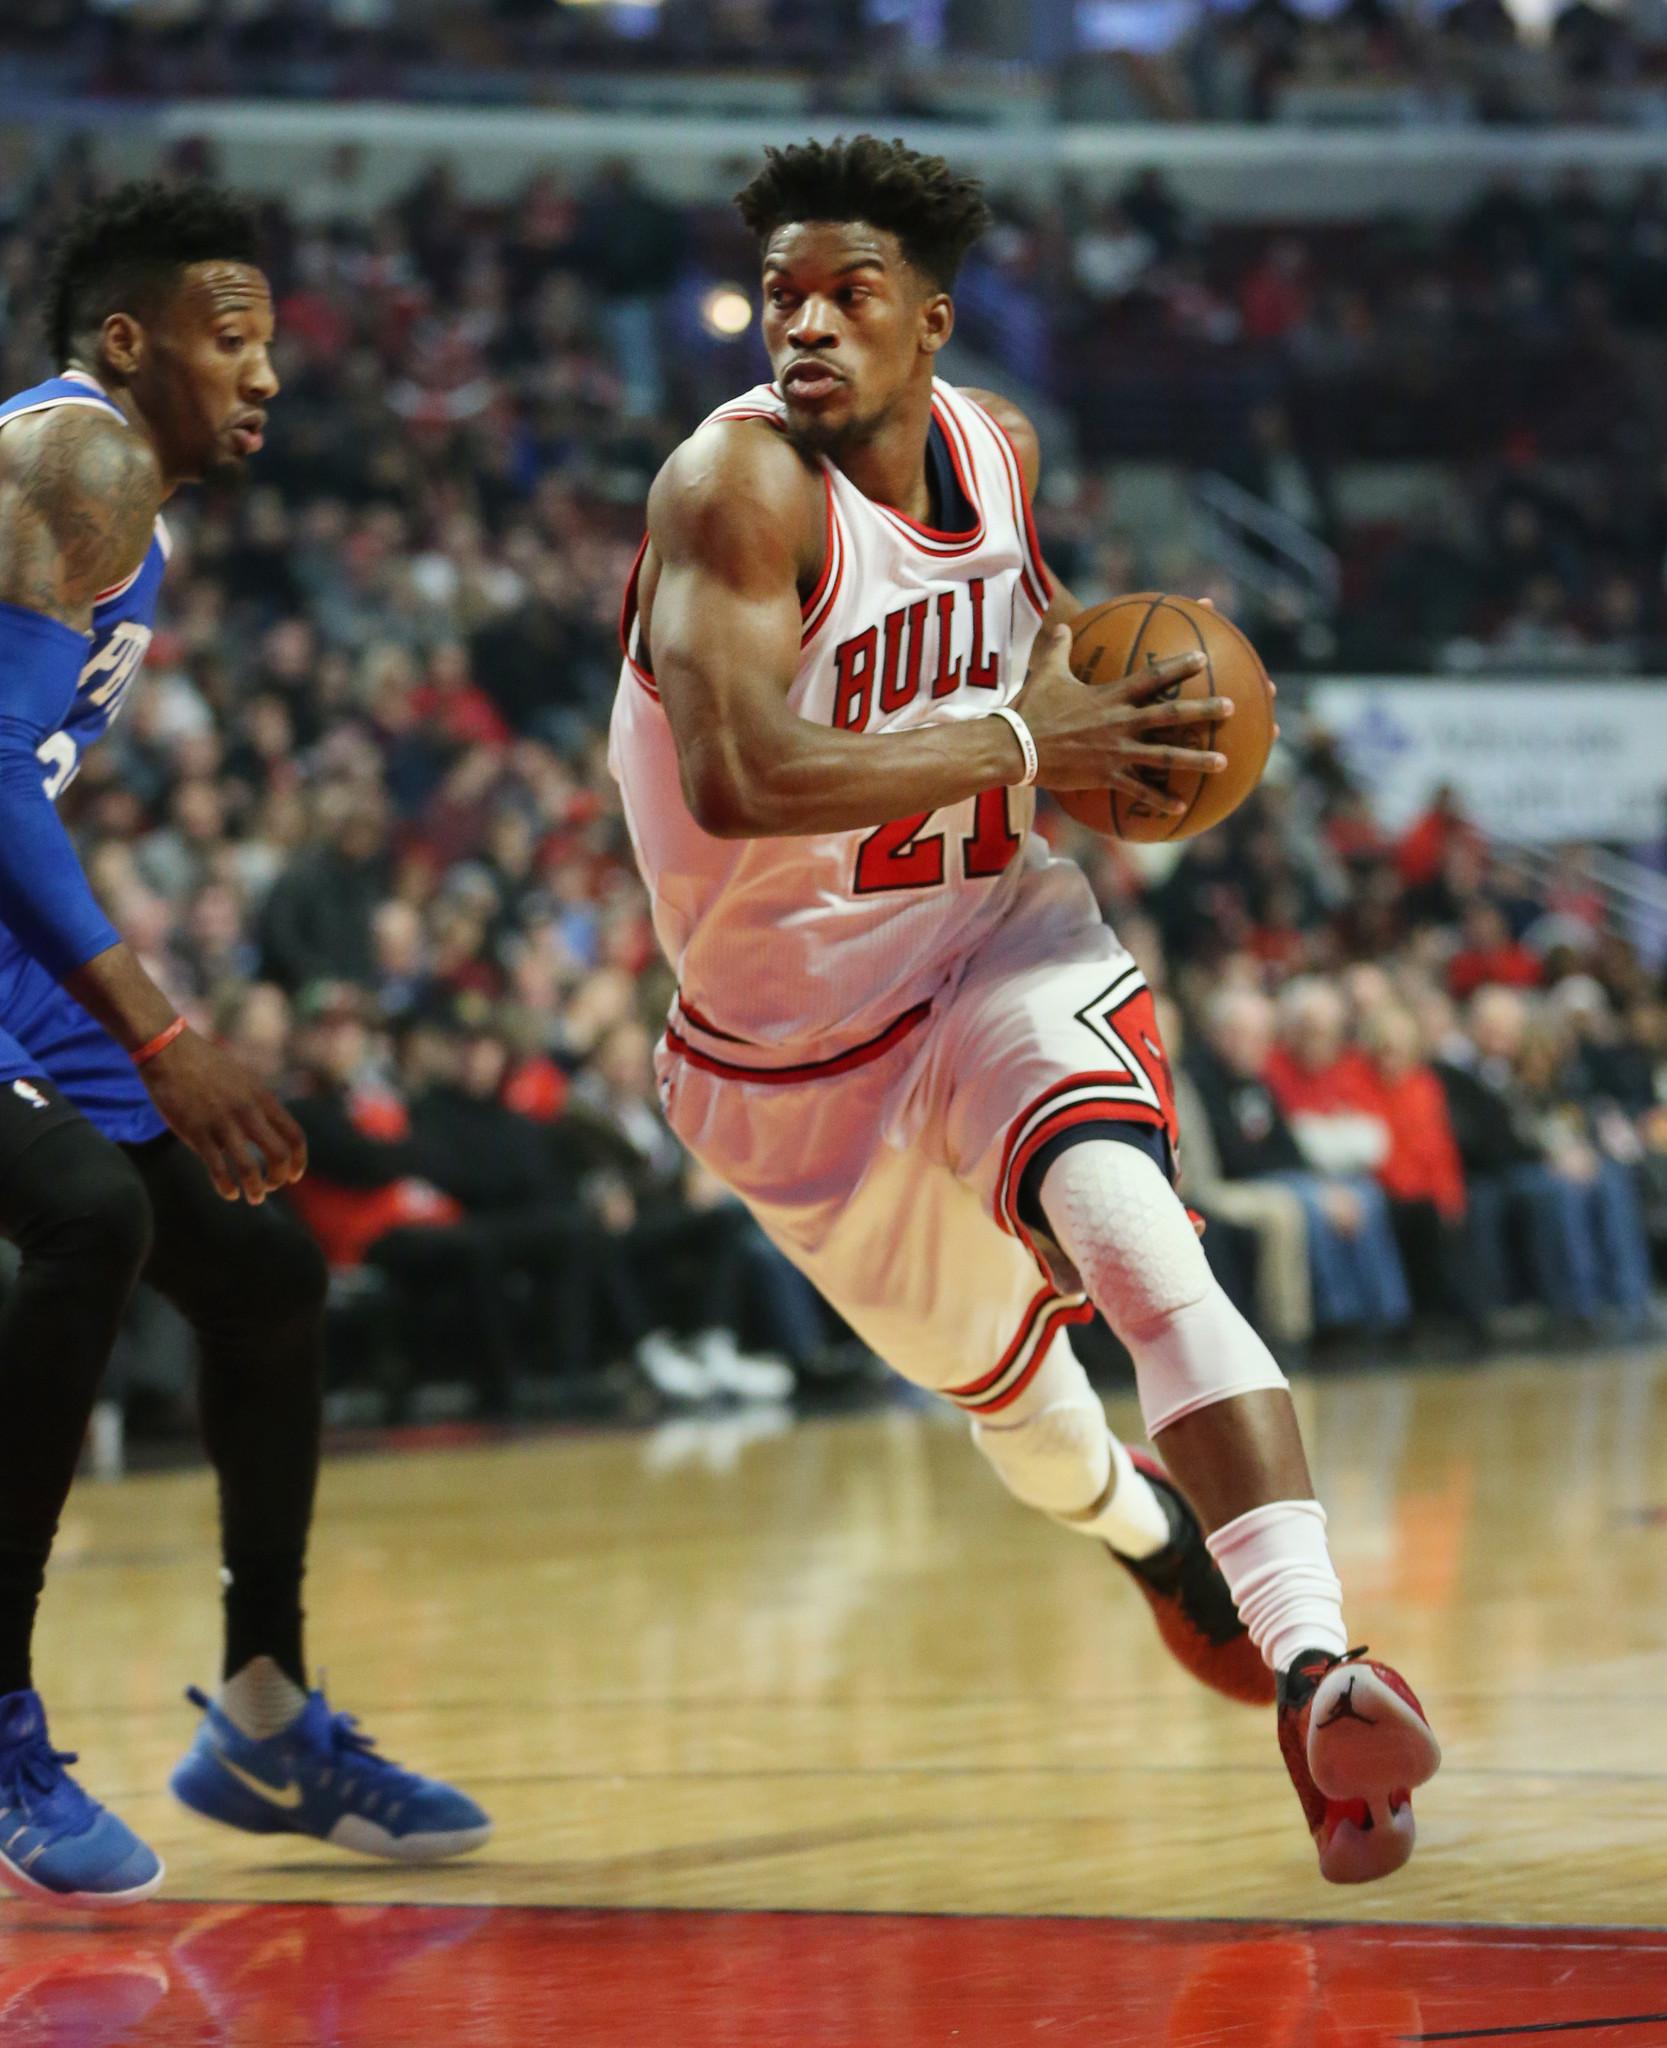 Ct Pick 3 >> Will Celtics follow Raptors' aggressive lead and bid for Jimmy Butler? - Chicago Tribune